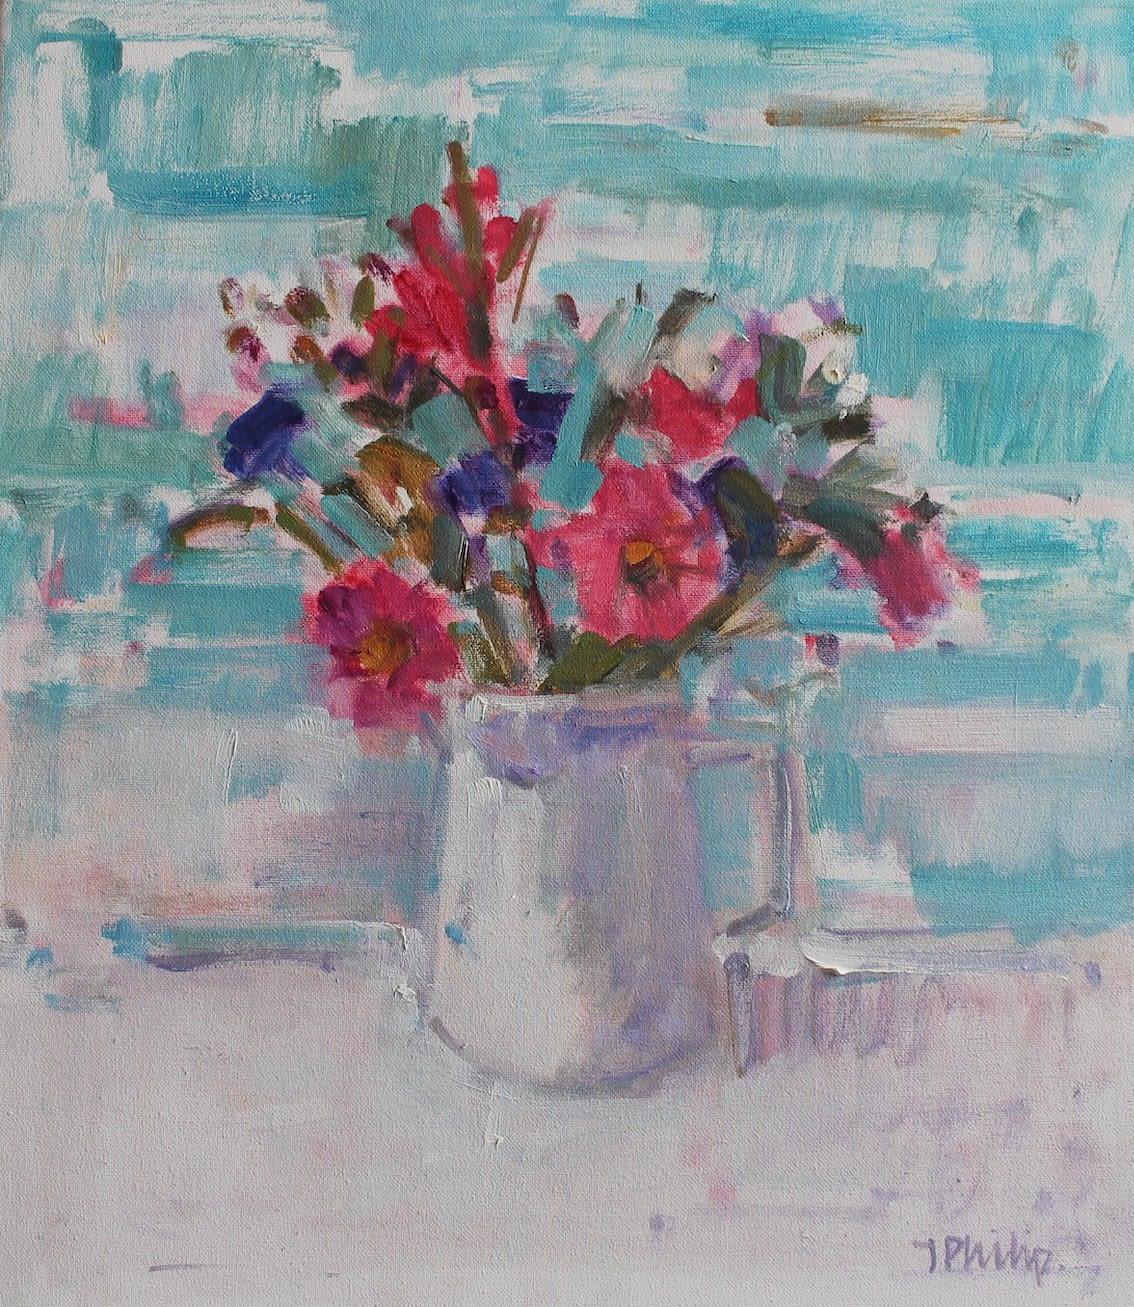 Jackie Philip, Coastal Colours, 2020